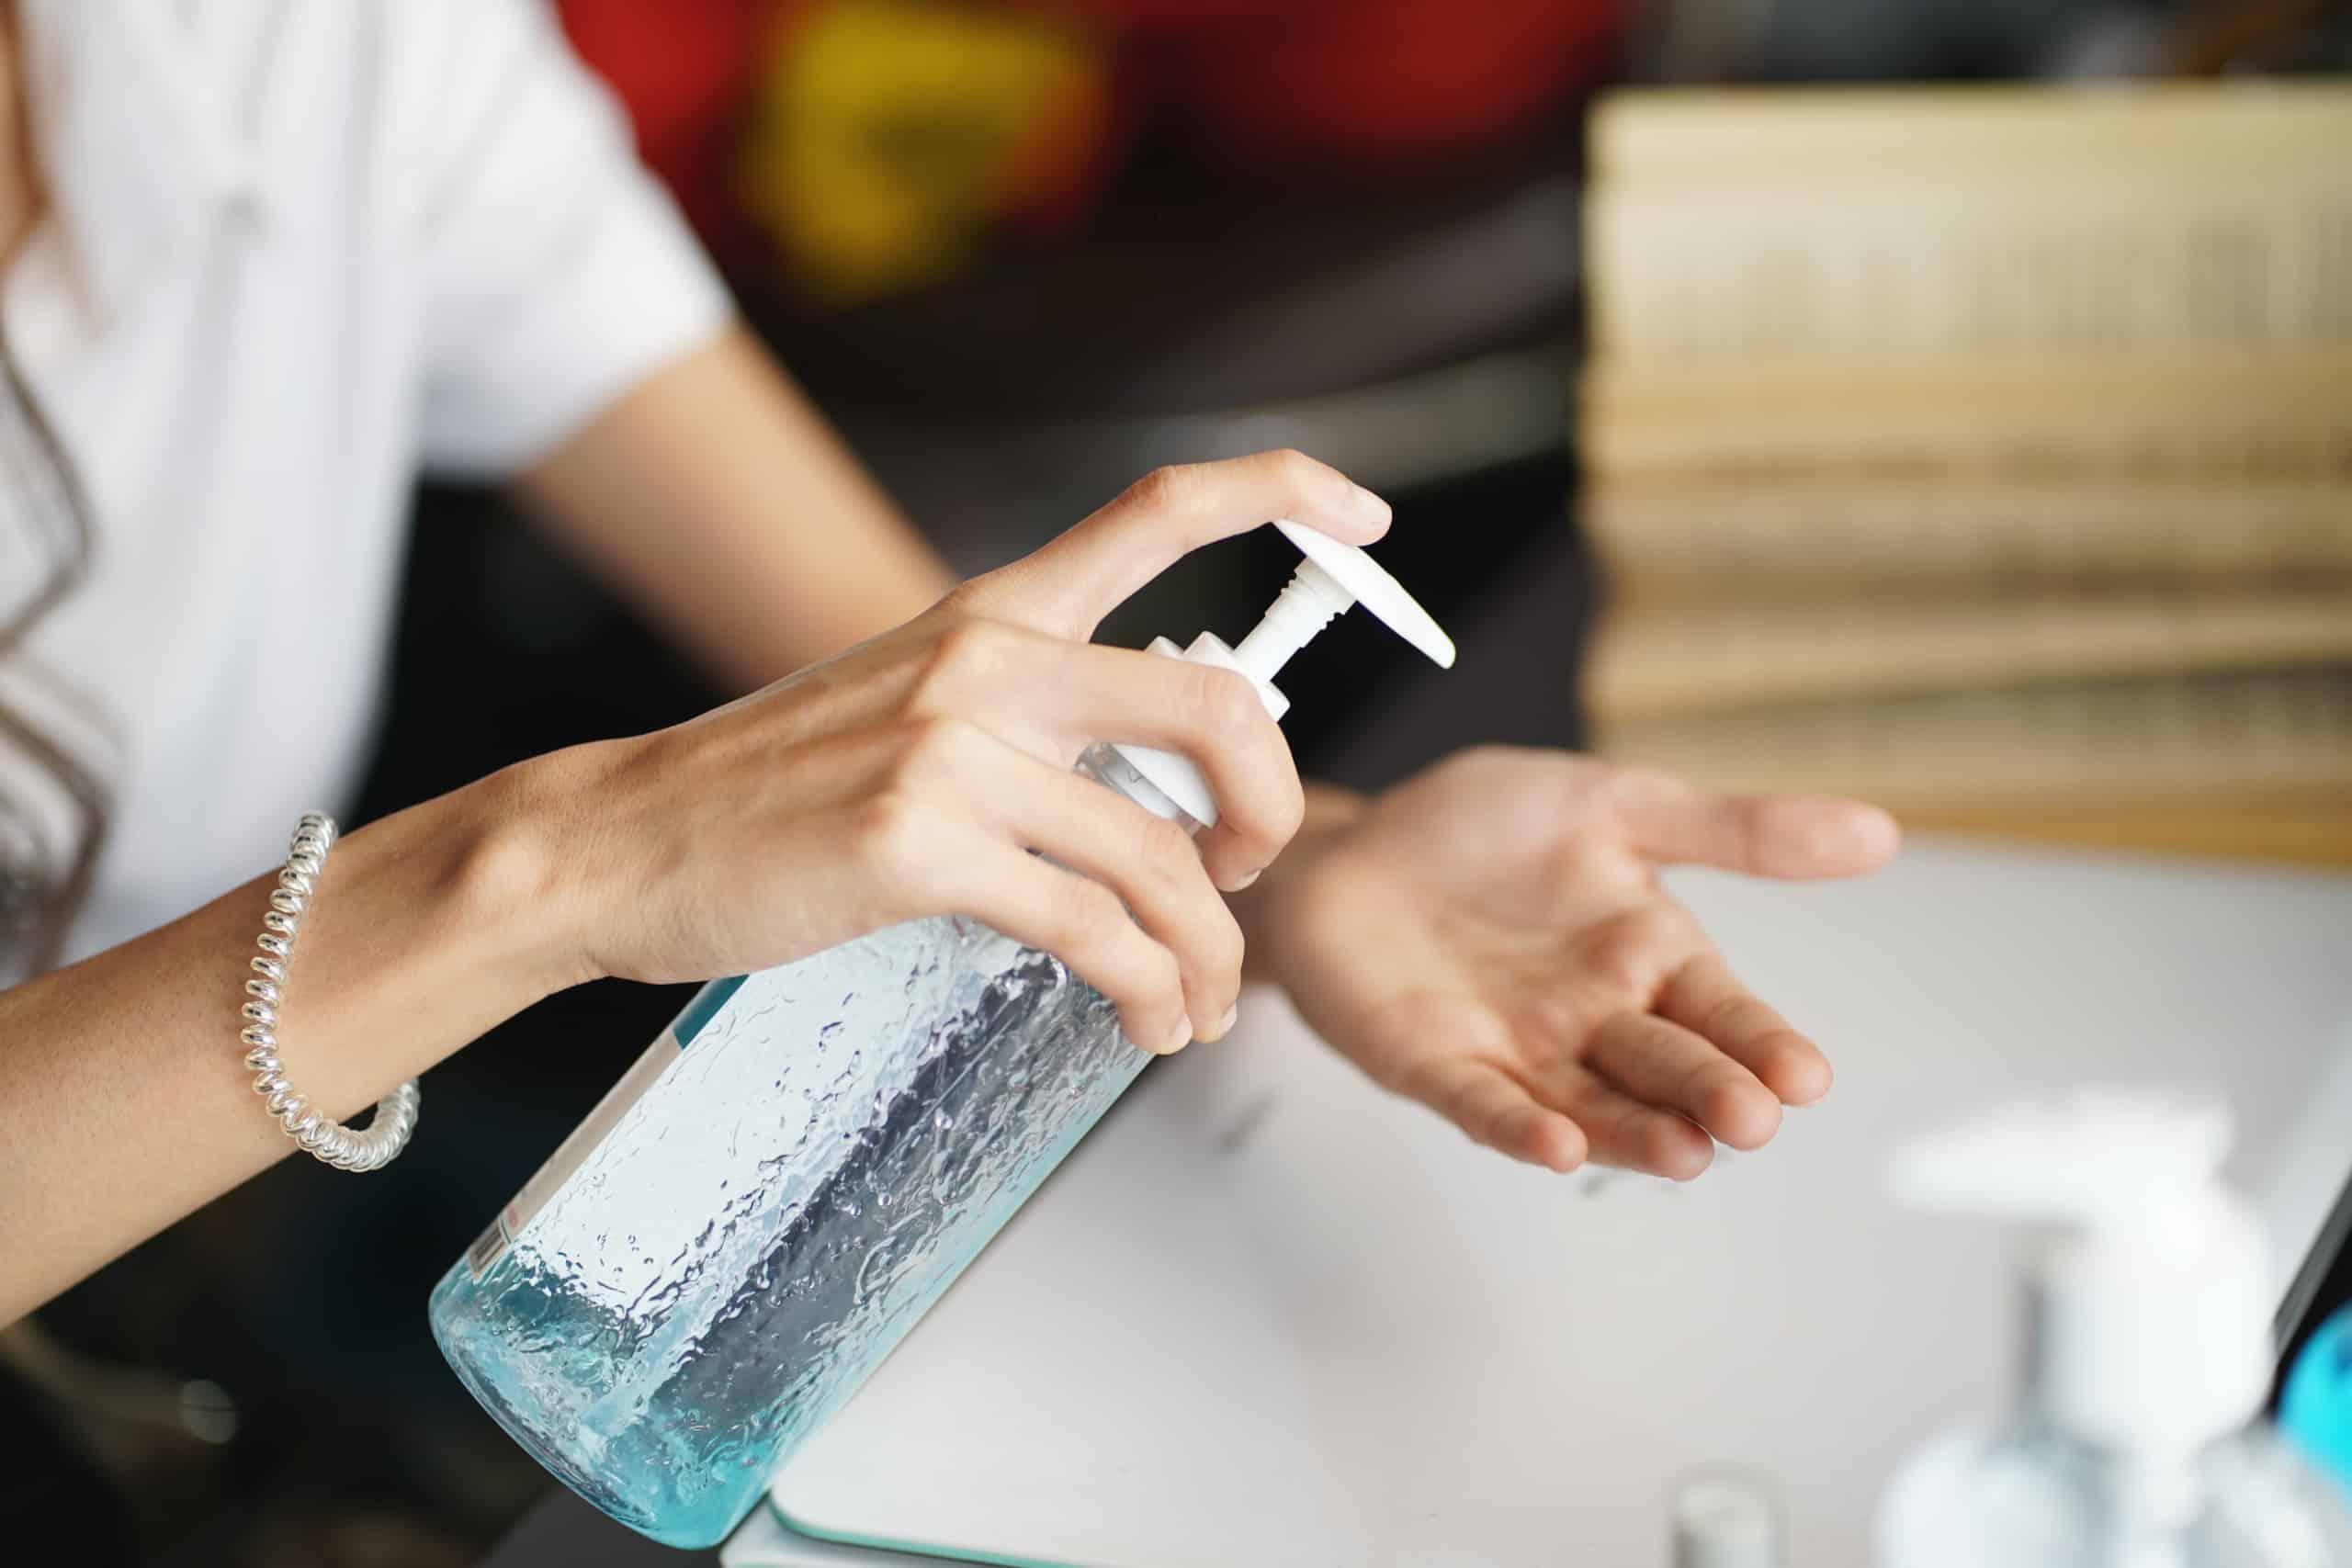 Hand sanitizer regulations